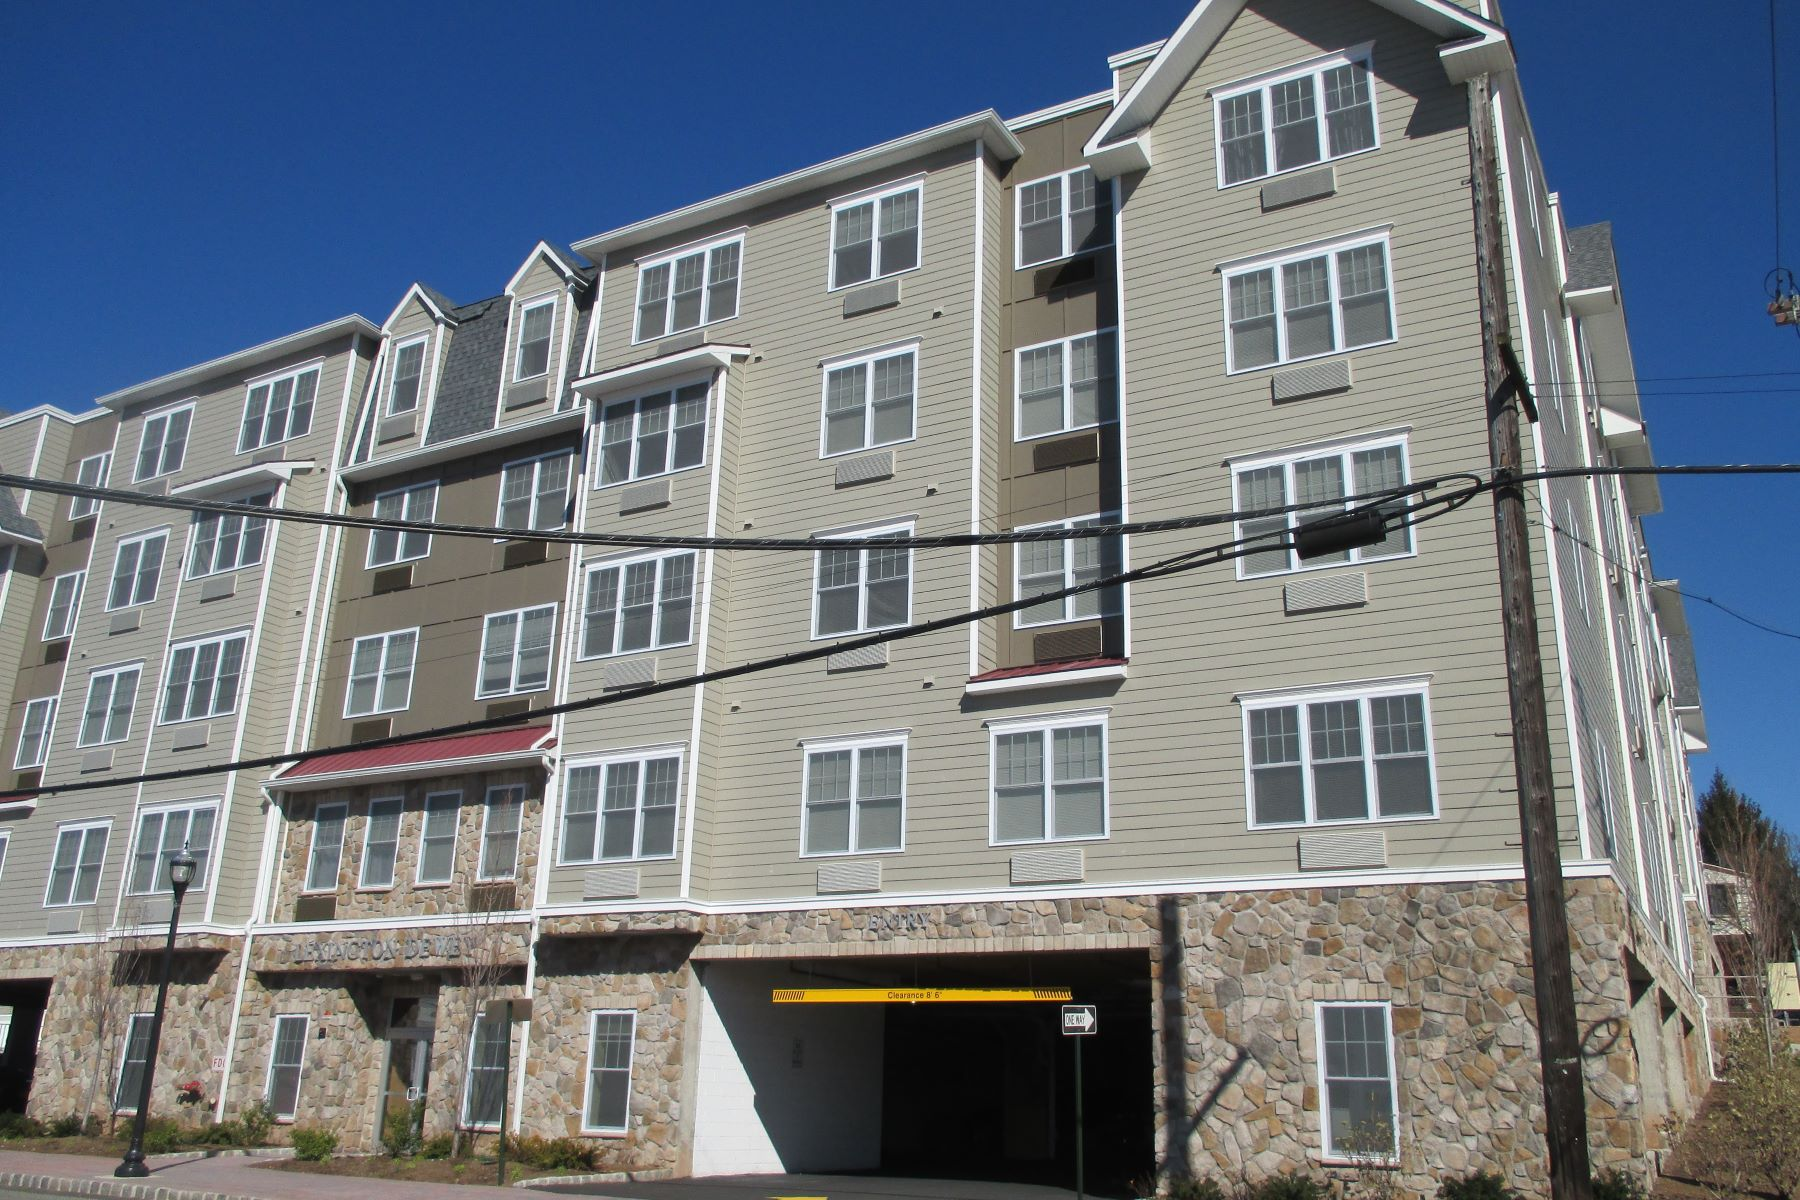 شقة للـ Rent في Lexington Dewey 297 Palisade Ave. #508-H, Bogota, New Jersey, 07603 United States